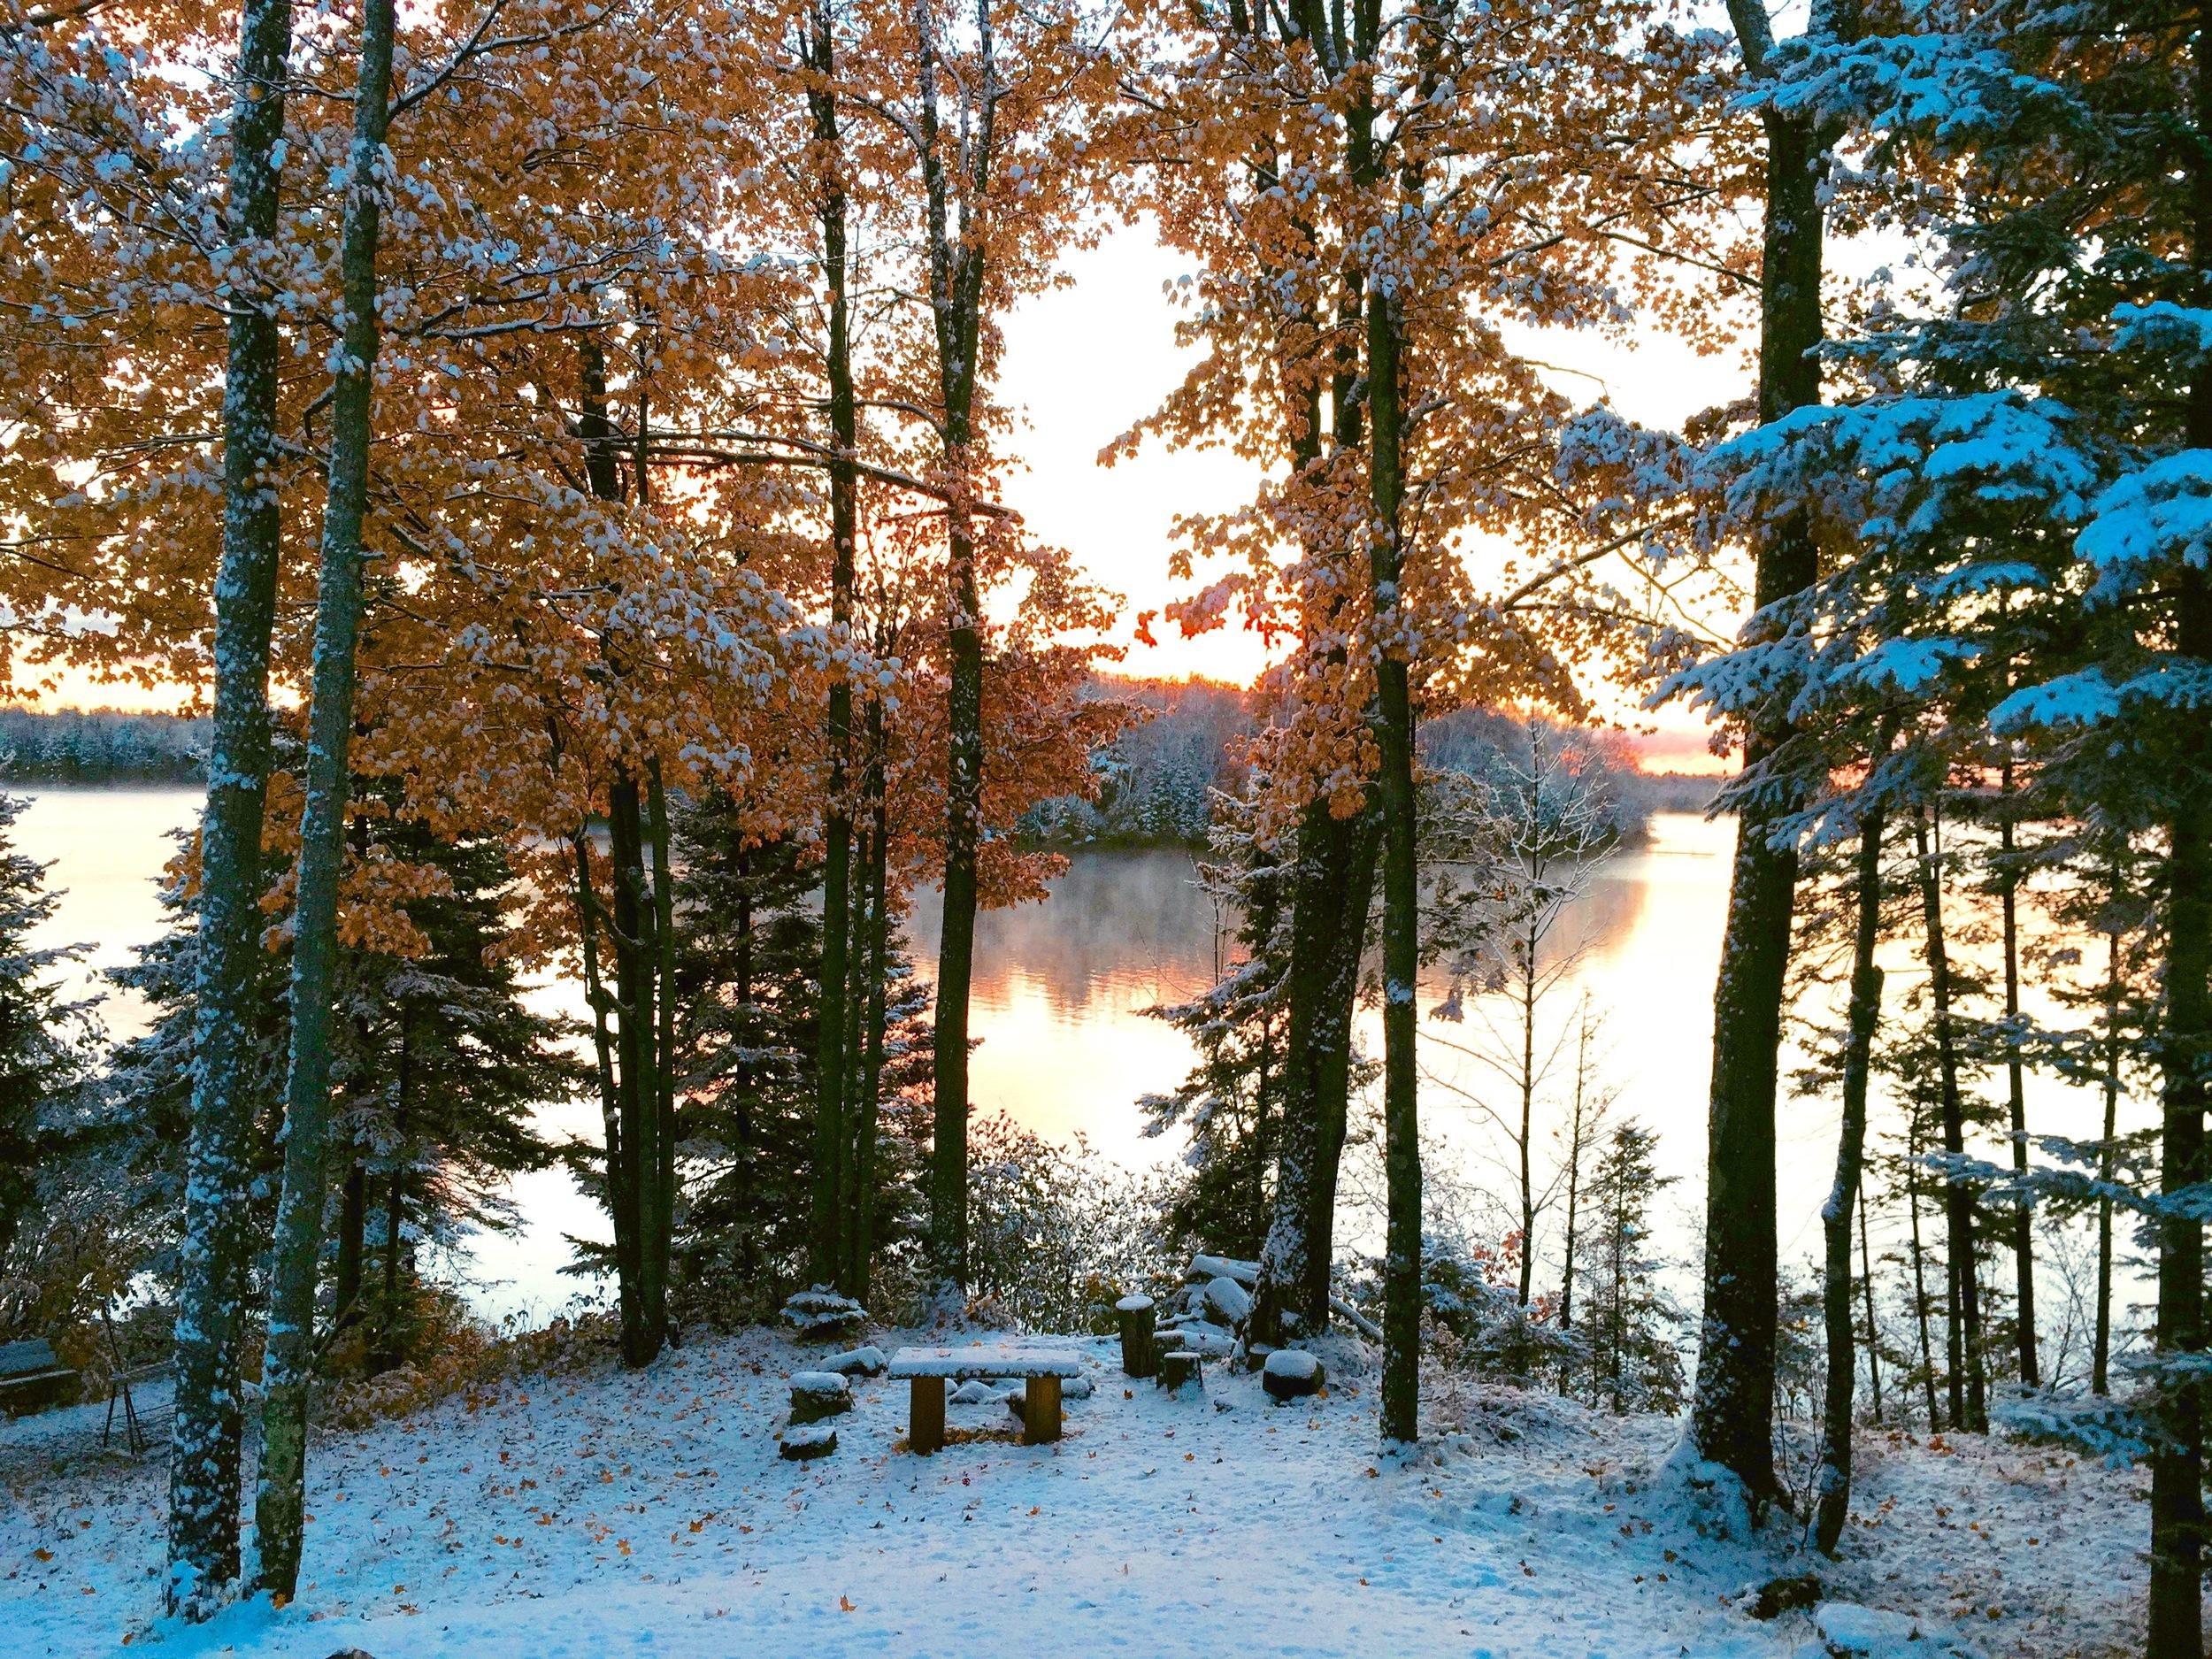 Presque Isle, Wisconsin, October 17th, 2015